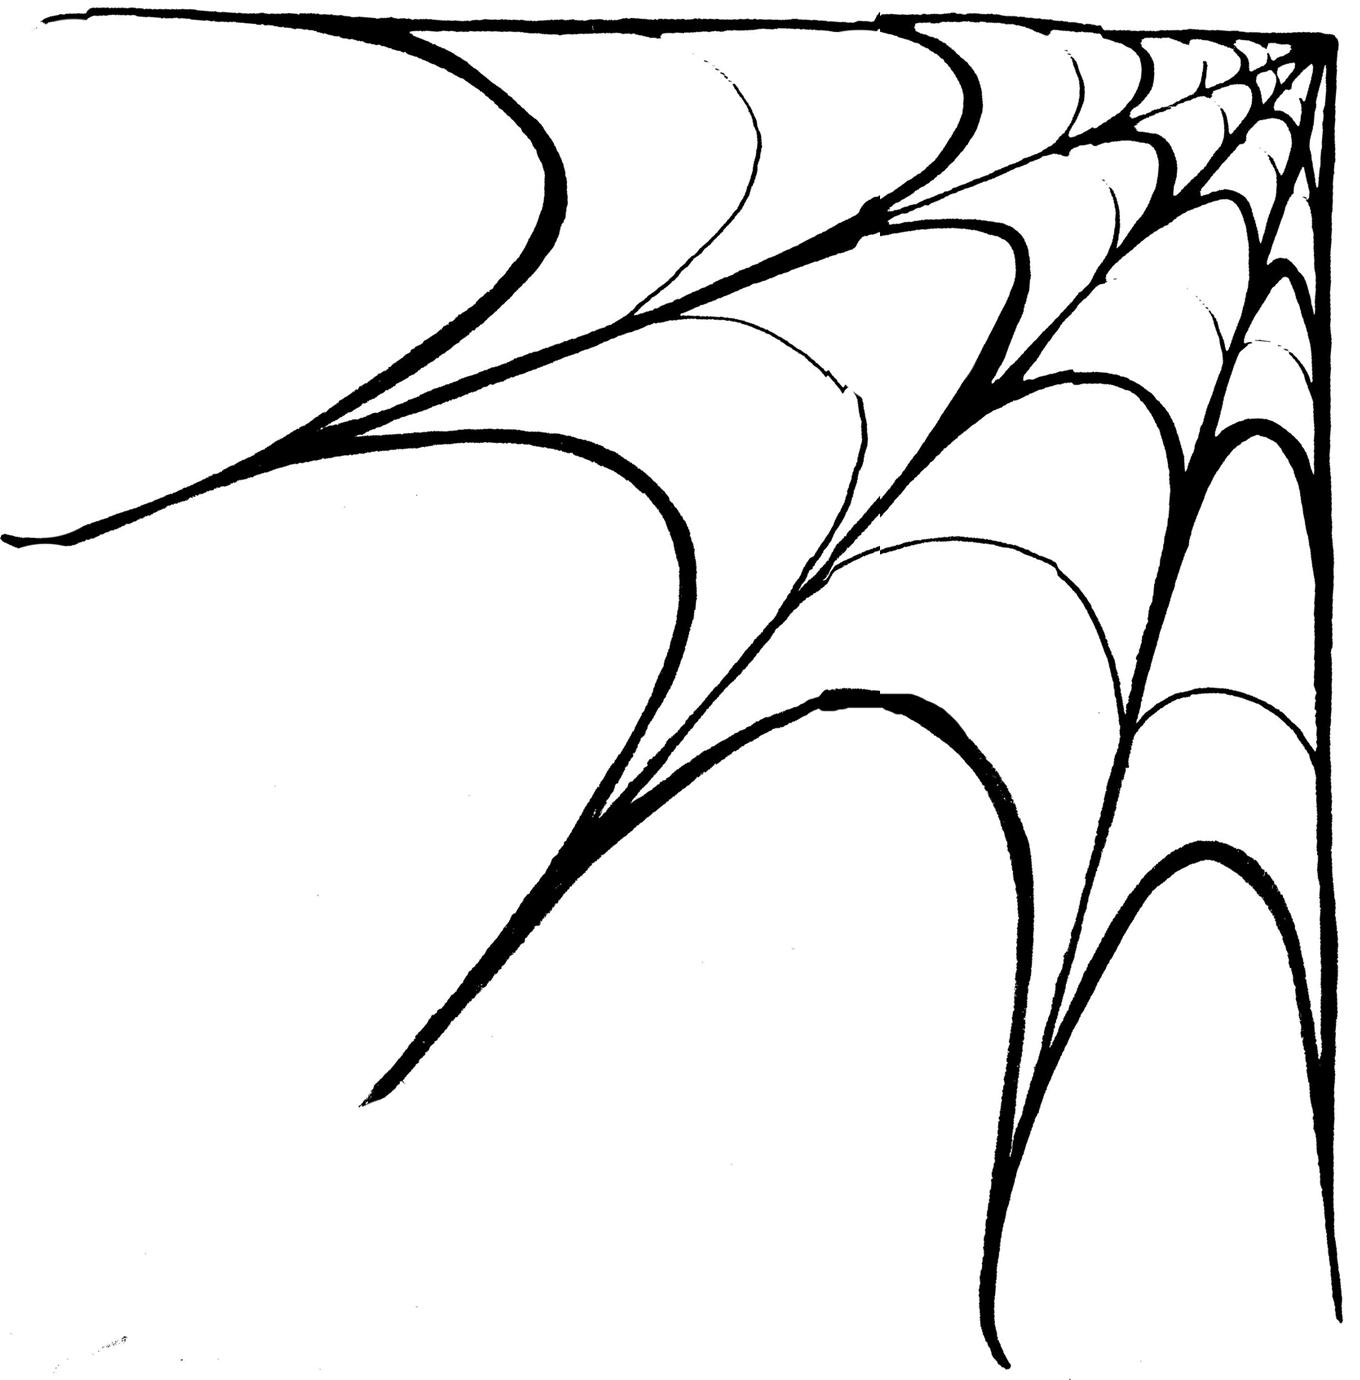 1360x1380 Spider Web Border Clip Art Cliparts